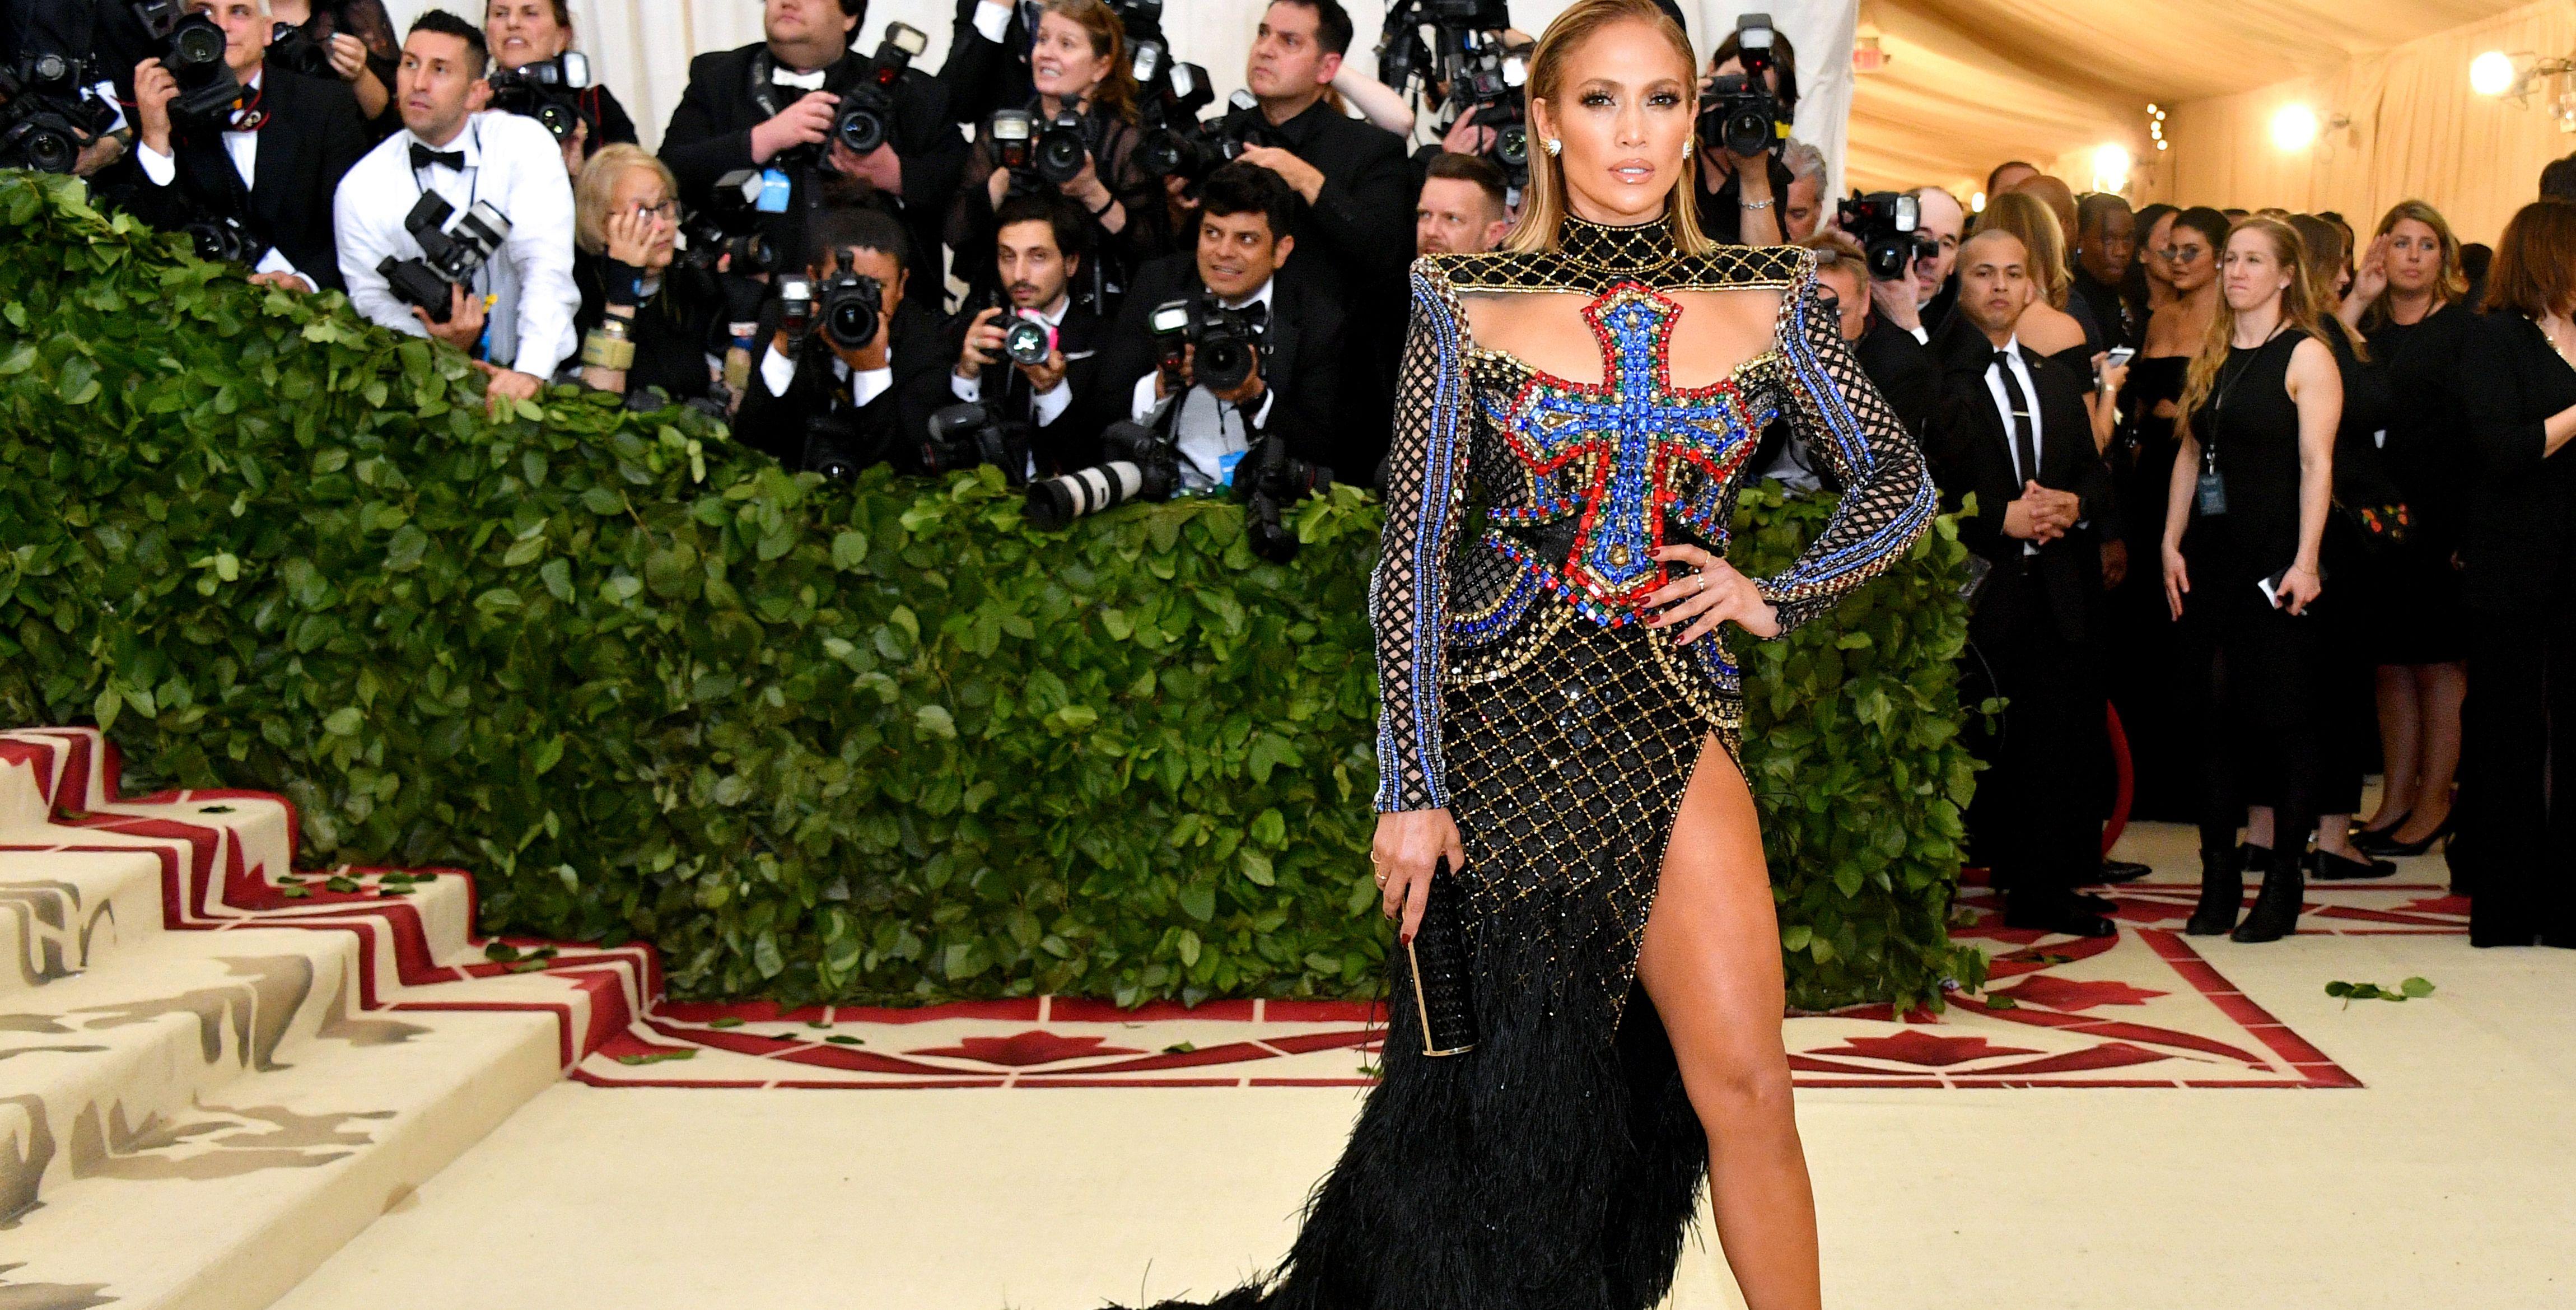 She joins past award recipients Rihanna, Beyonce, Pharrell, and Naomi Campbell.